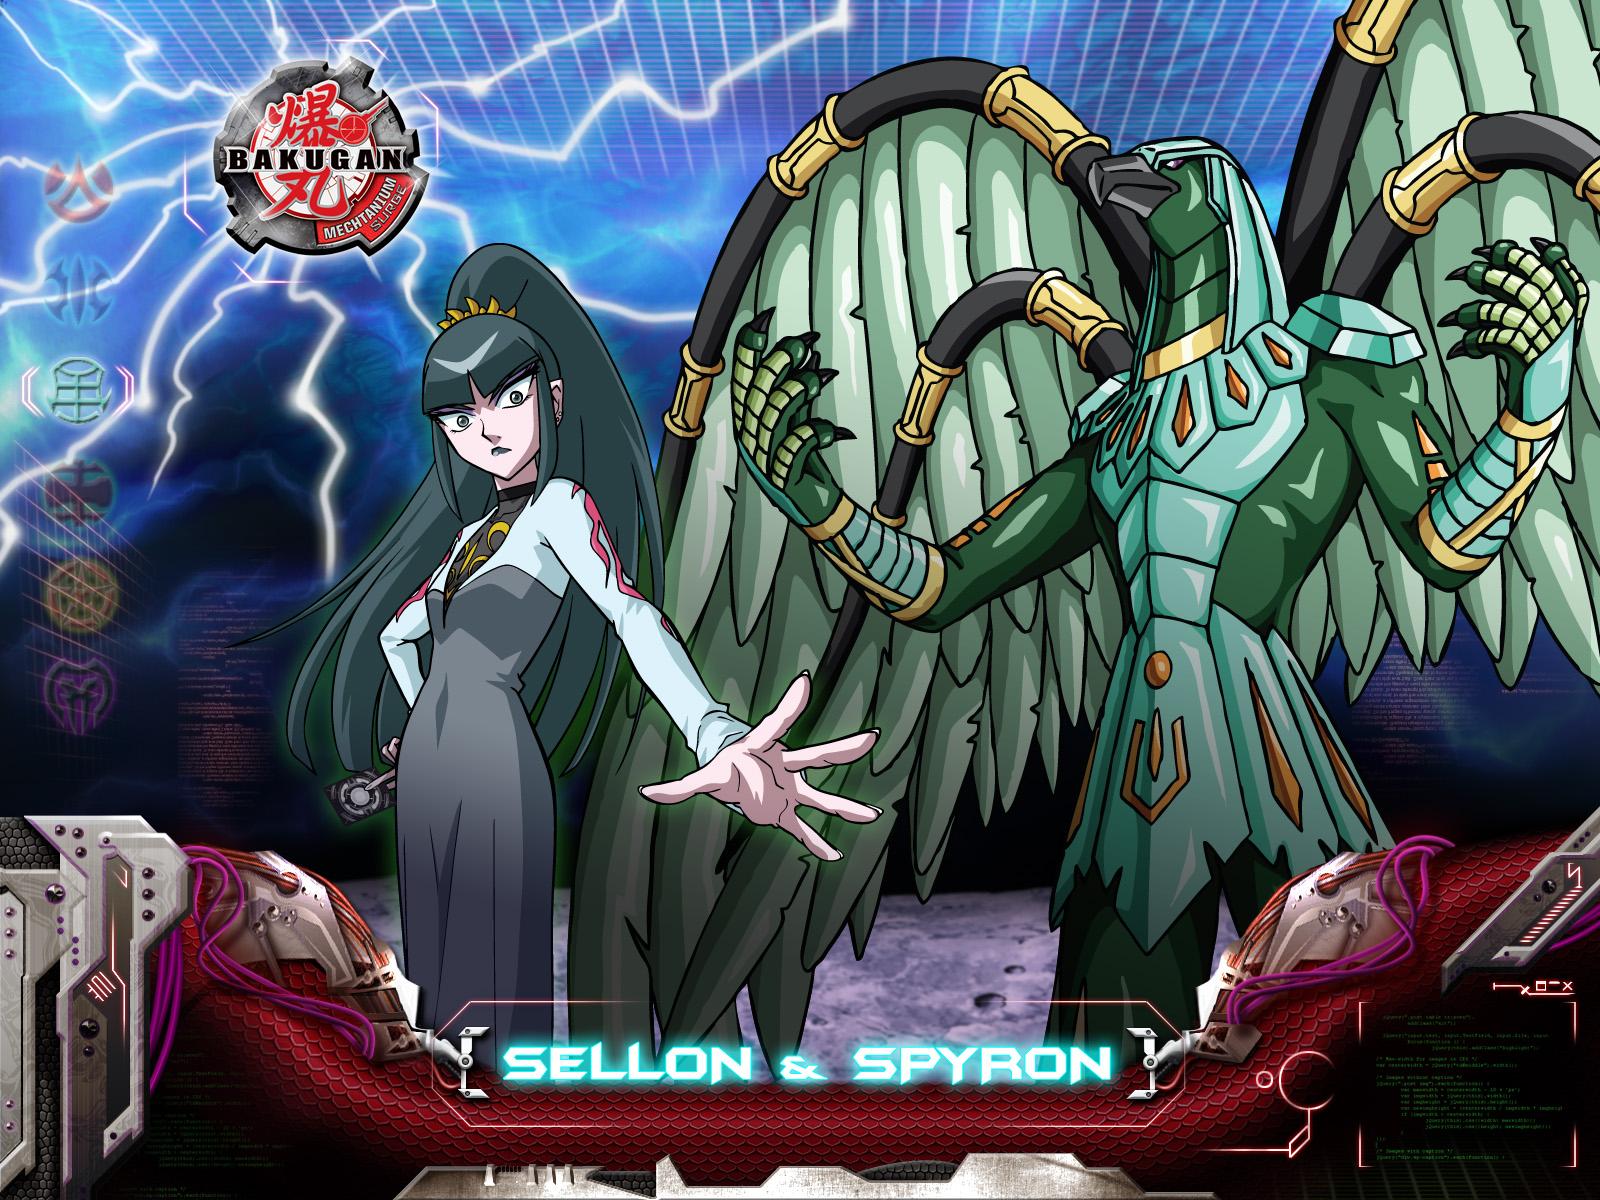 Bakugan mechtanium surge bakugan battle brawlers zerochan anime sellon download sellon image voltagebd Gallery